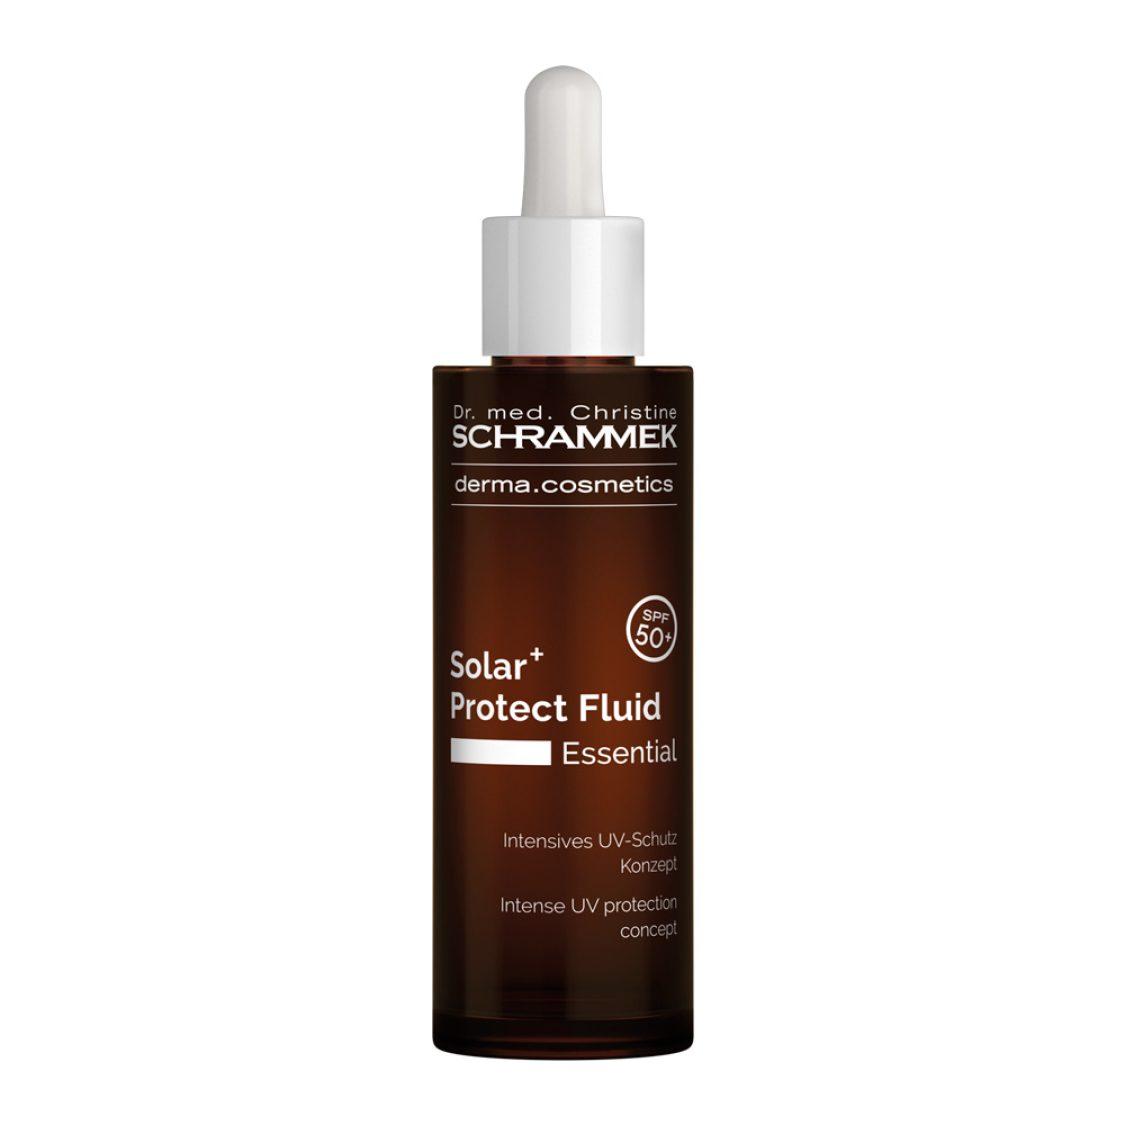 Dr. Schrammek - Solar + Protect Fluid SPF 50